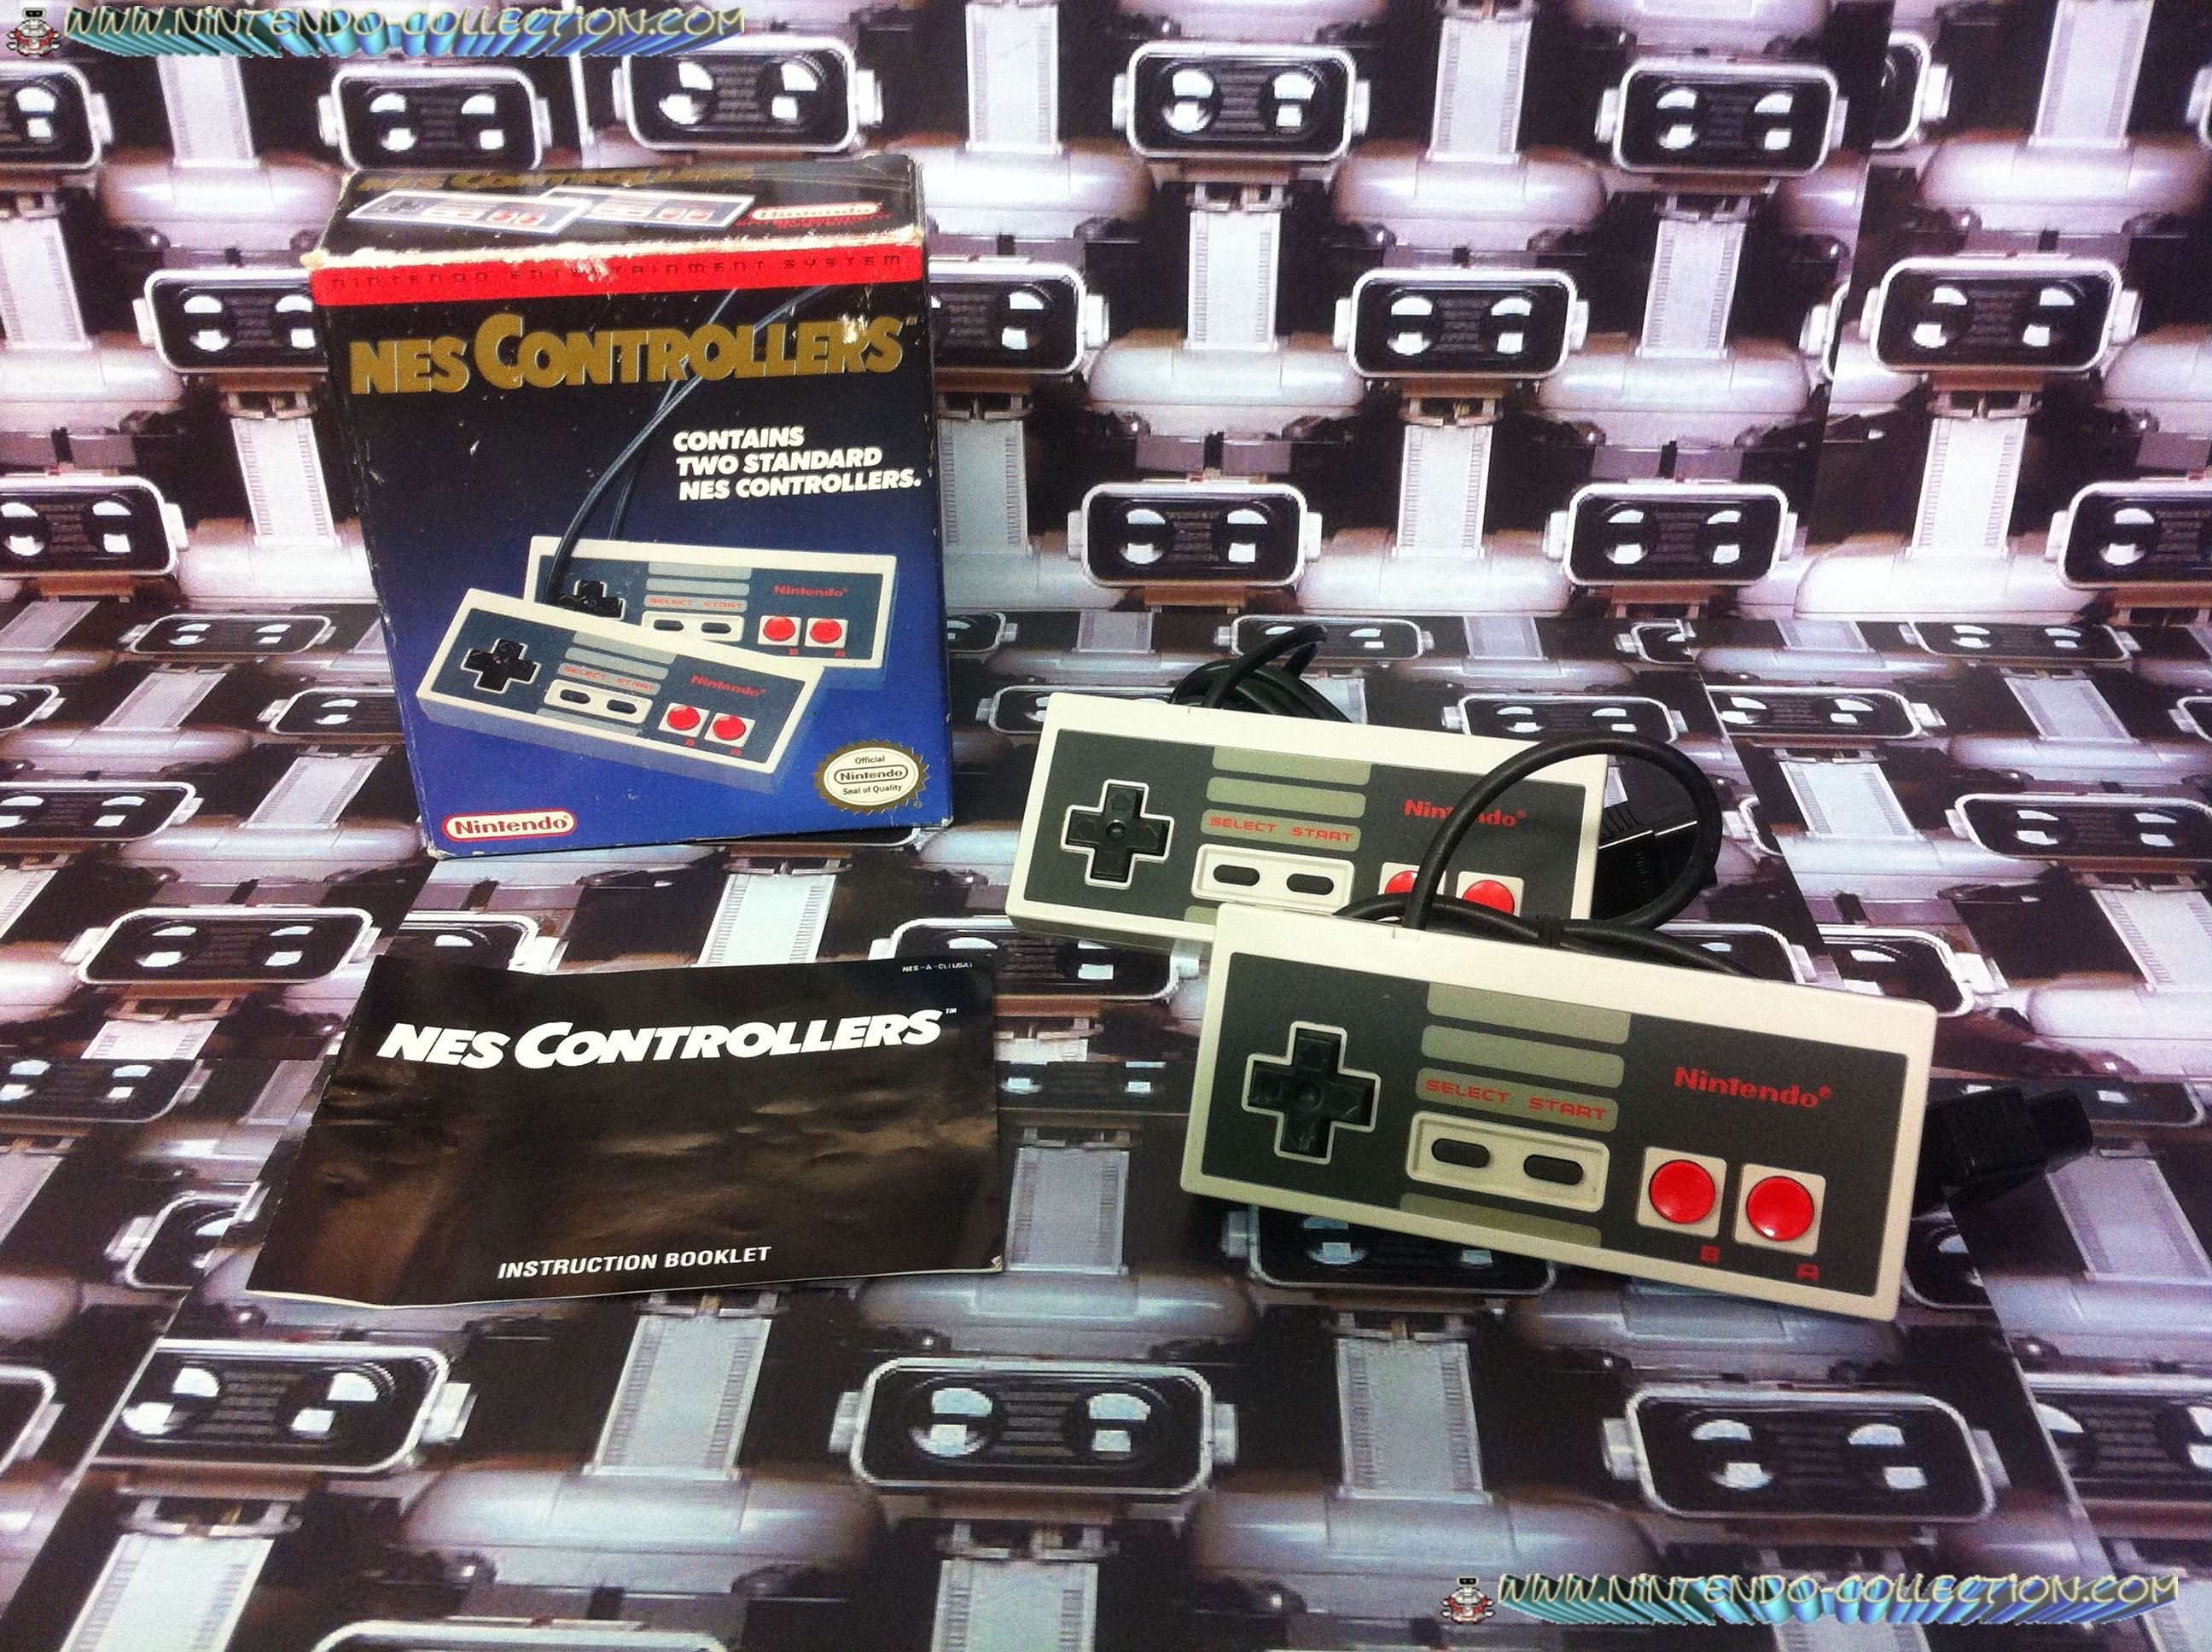 www.nintendo-collection.com - Nes Controllers Pack - Pack Manettes NES Accessoire en boite Us - Acce